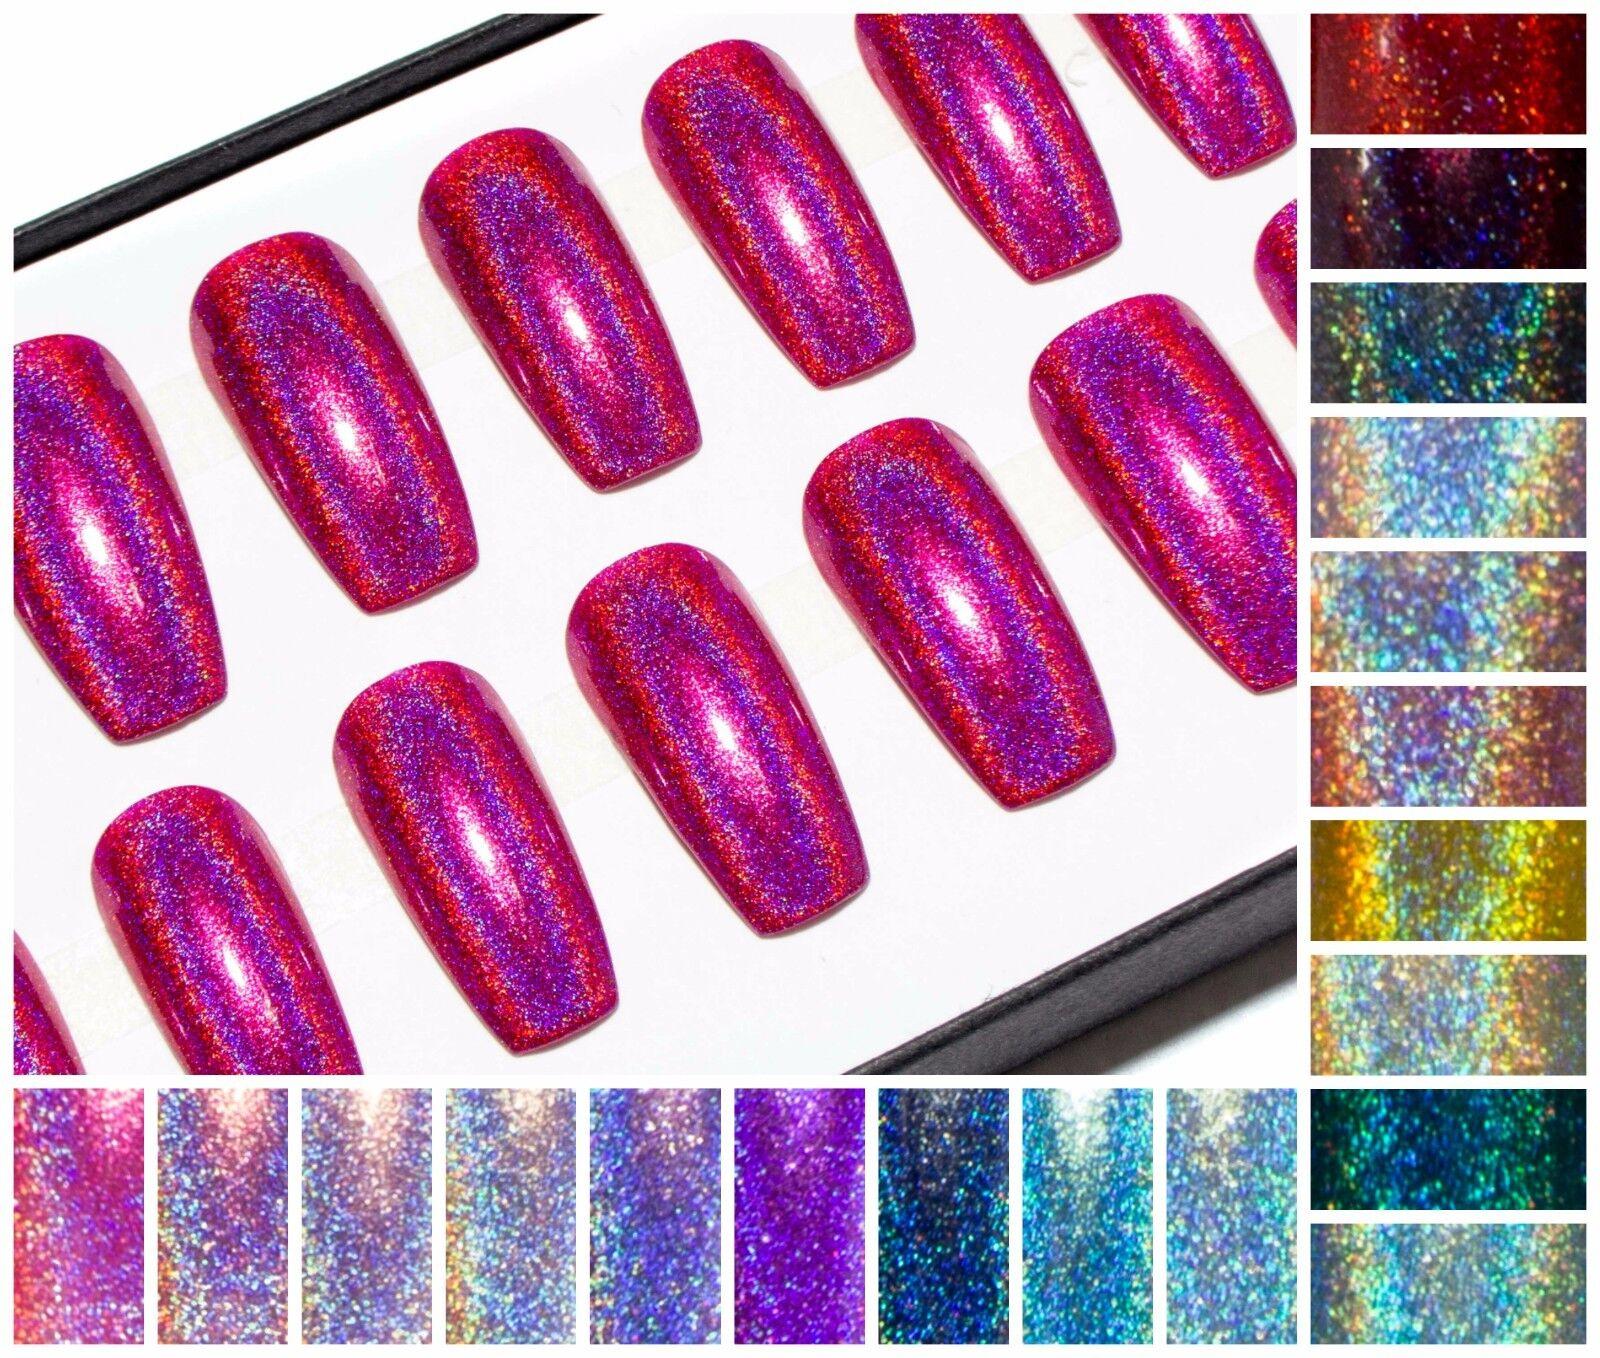 Press-On Nails , Nail Care, Manicure - Pedicure , Men